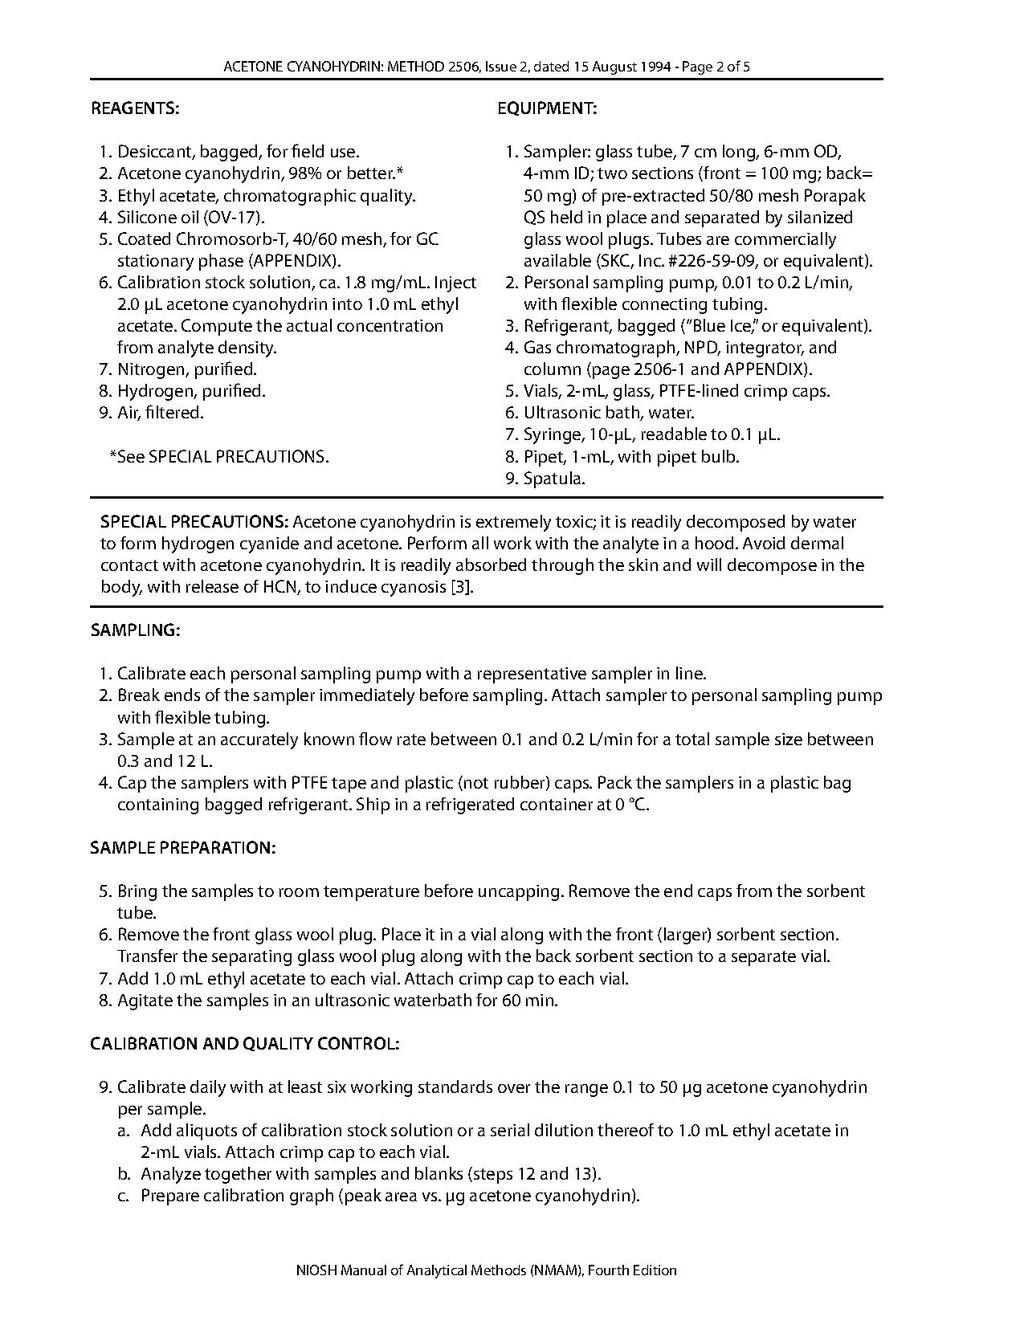 Page:NIOSH Manual of Analytical Methods - 2506 pdf/2